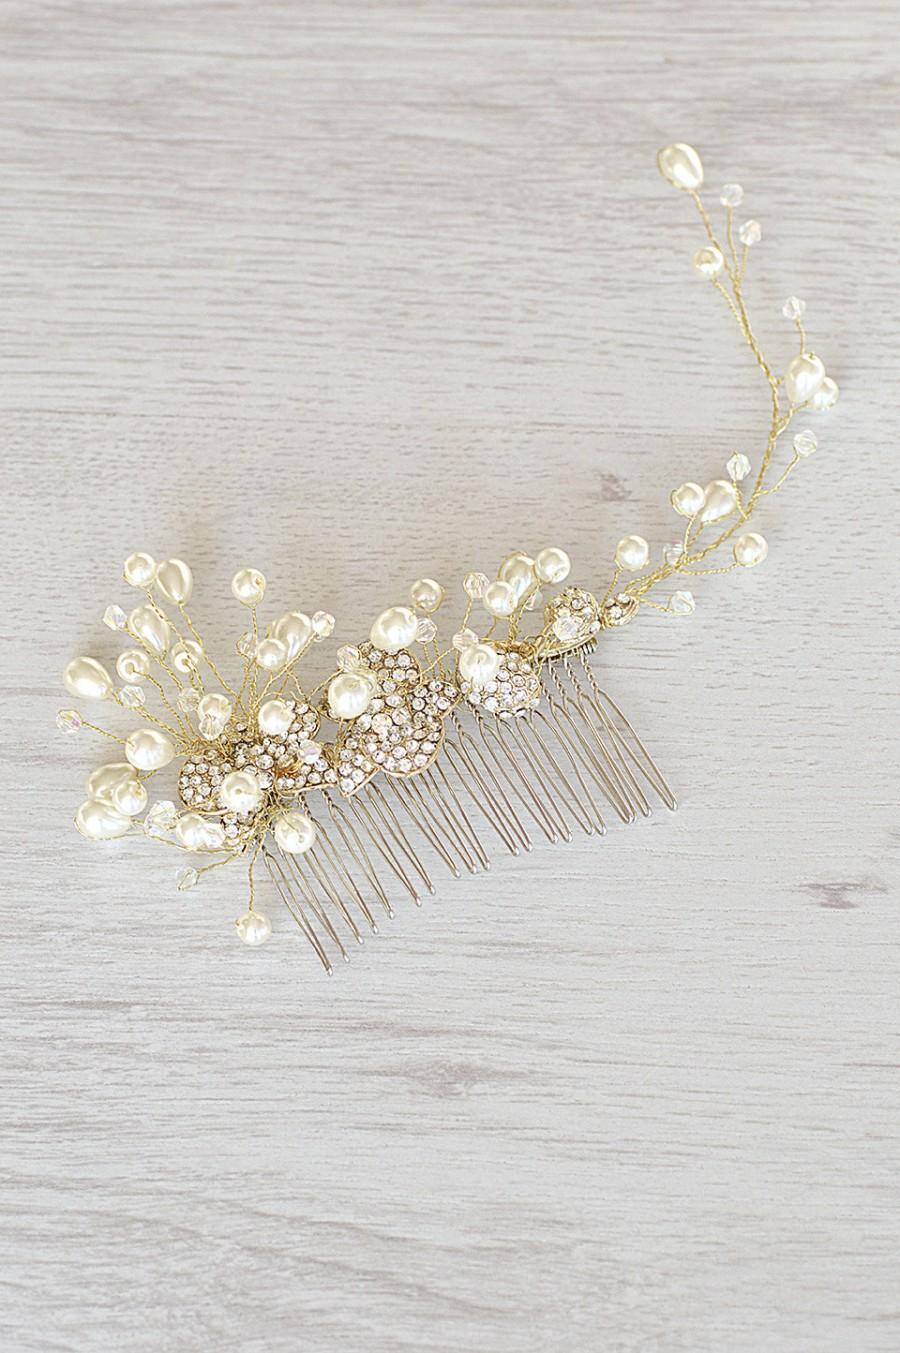 زفاف - Wedding Pearl Hair Piece, Gold Vine hair piece, Bridal Hair Comb, Vintage wedding, Large Pearl Comb, Bridal Hair Accessory, Gold vine crown